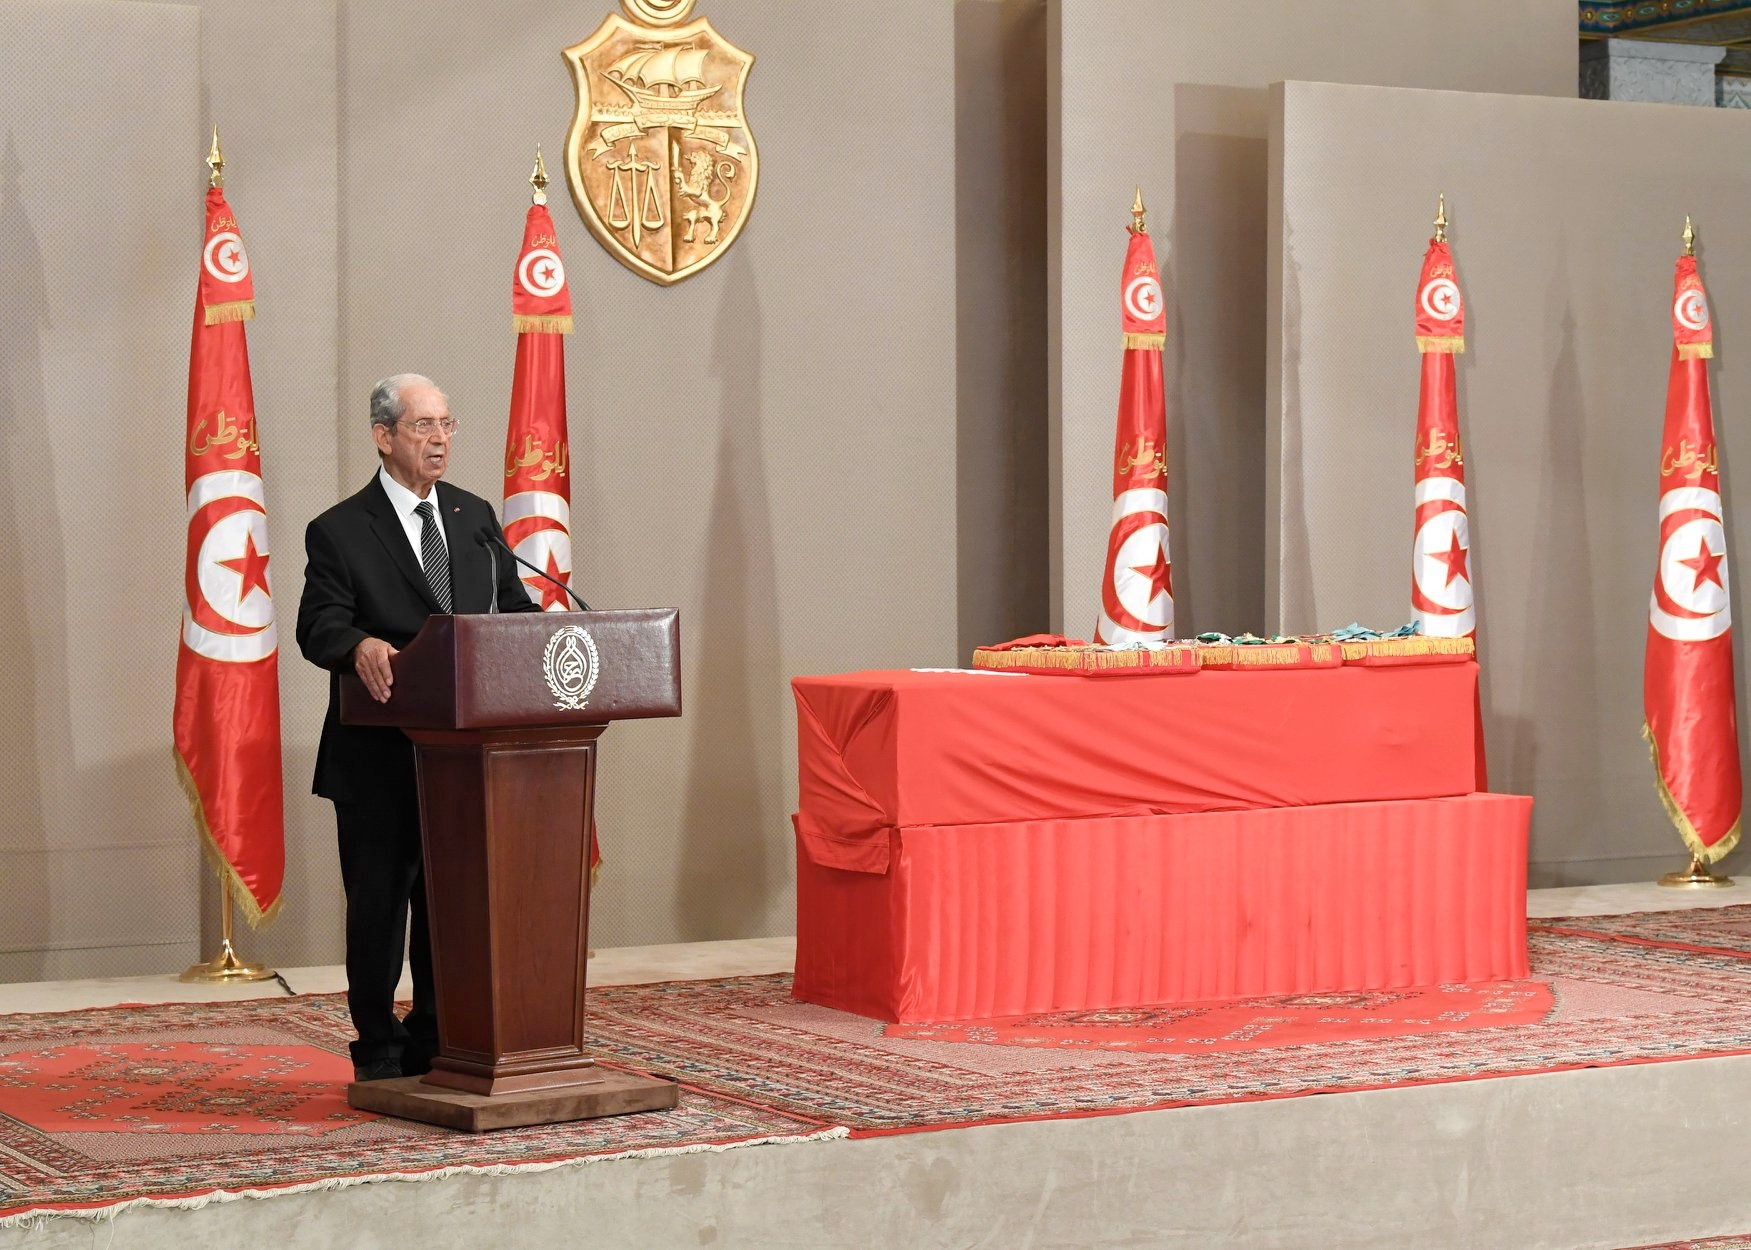 Cérémonie funèbre des obsèques de Béji Caïd Essebsi